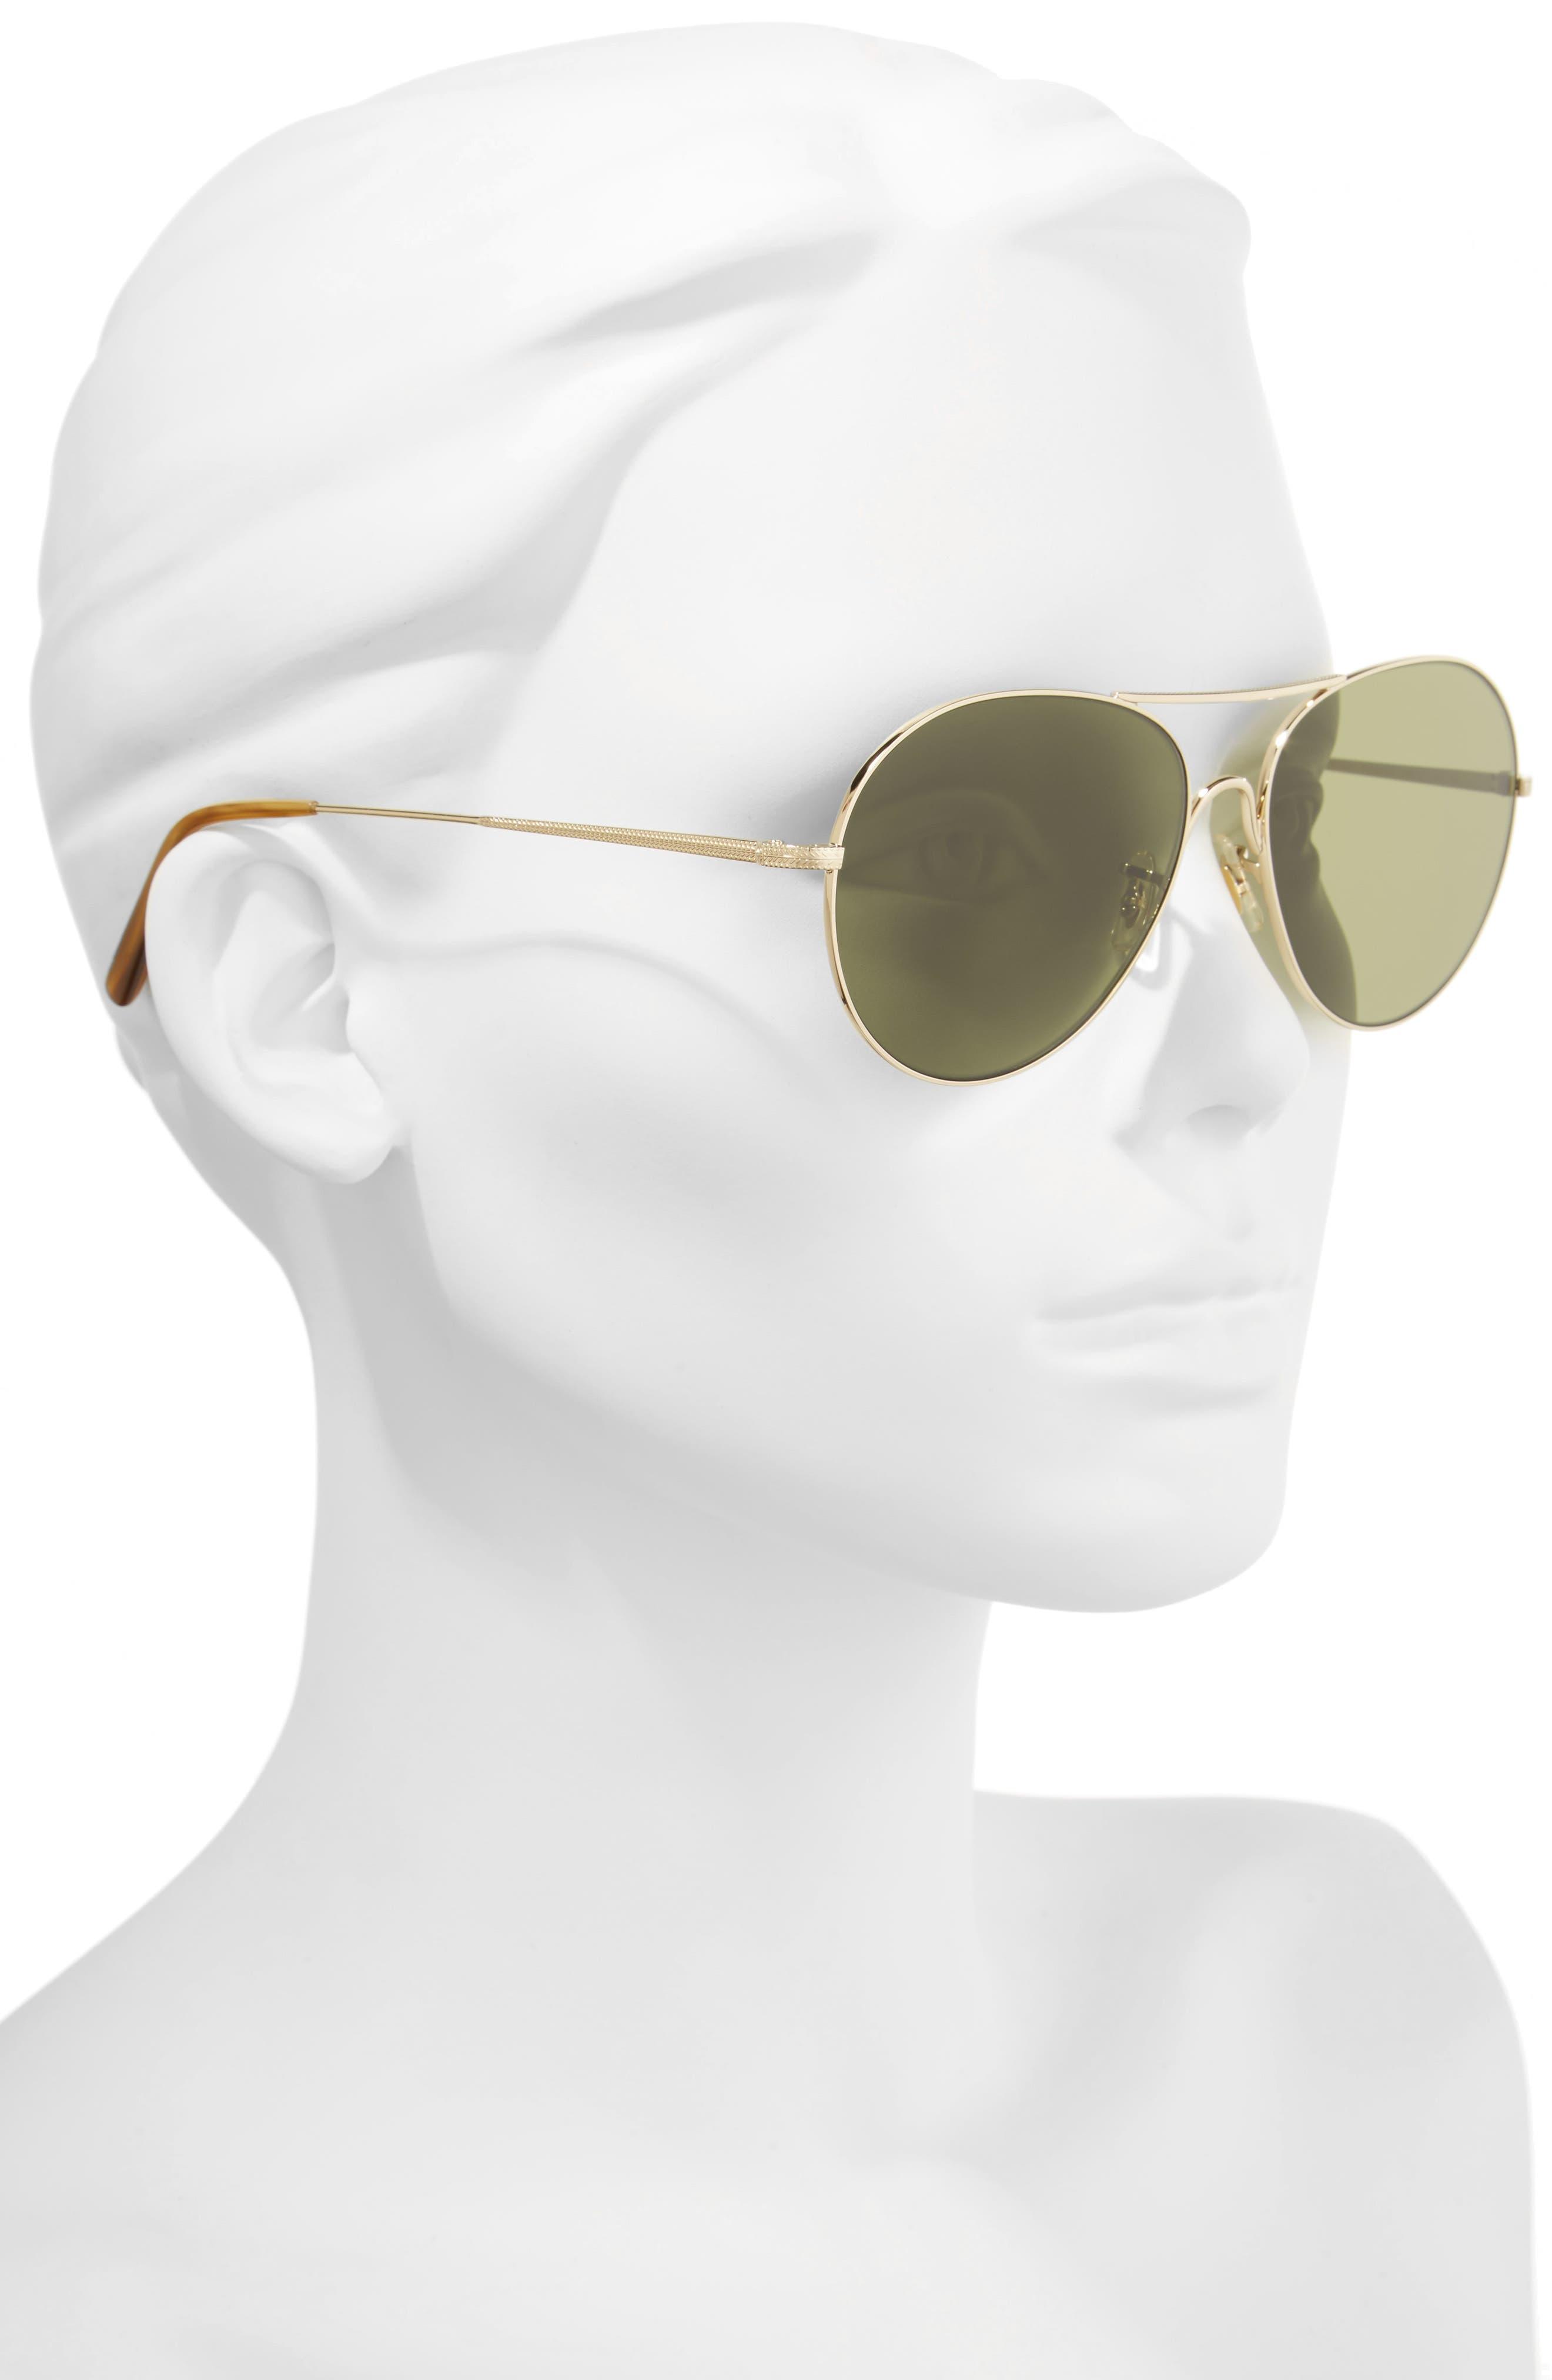 Rockmore 58mm Aviator Sunglasses,                             Alternate thumbnail 2, color,                             Gold/ Green